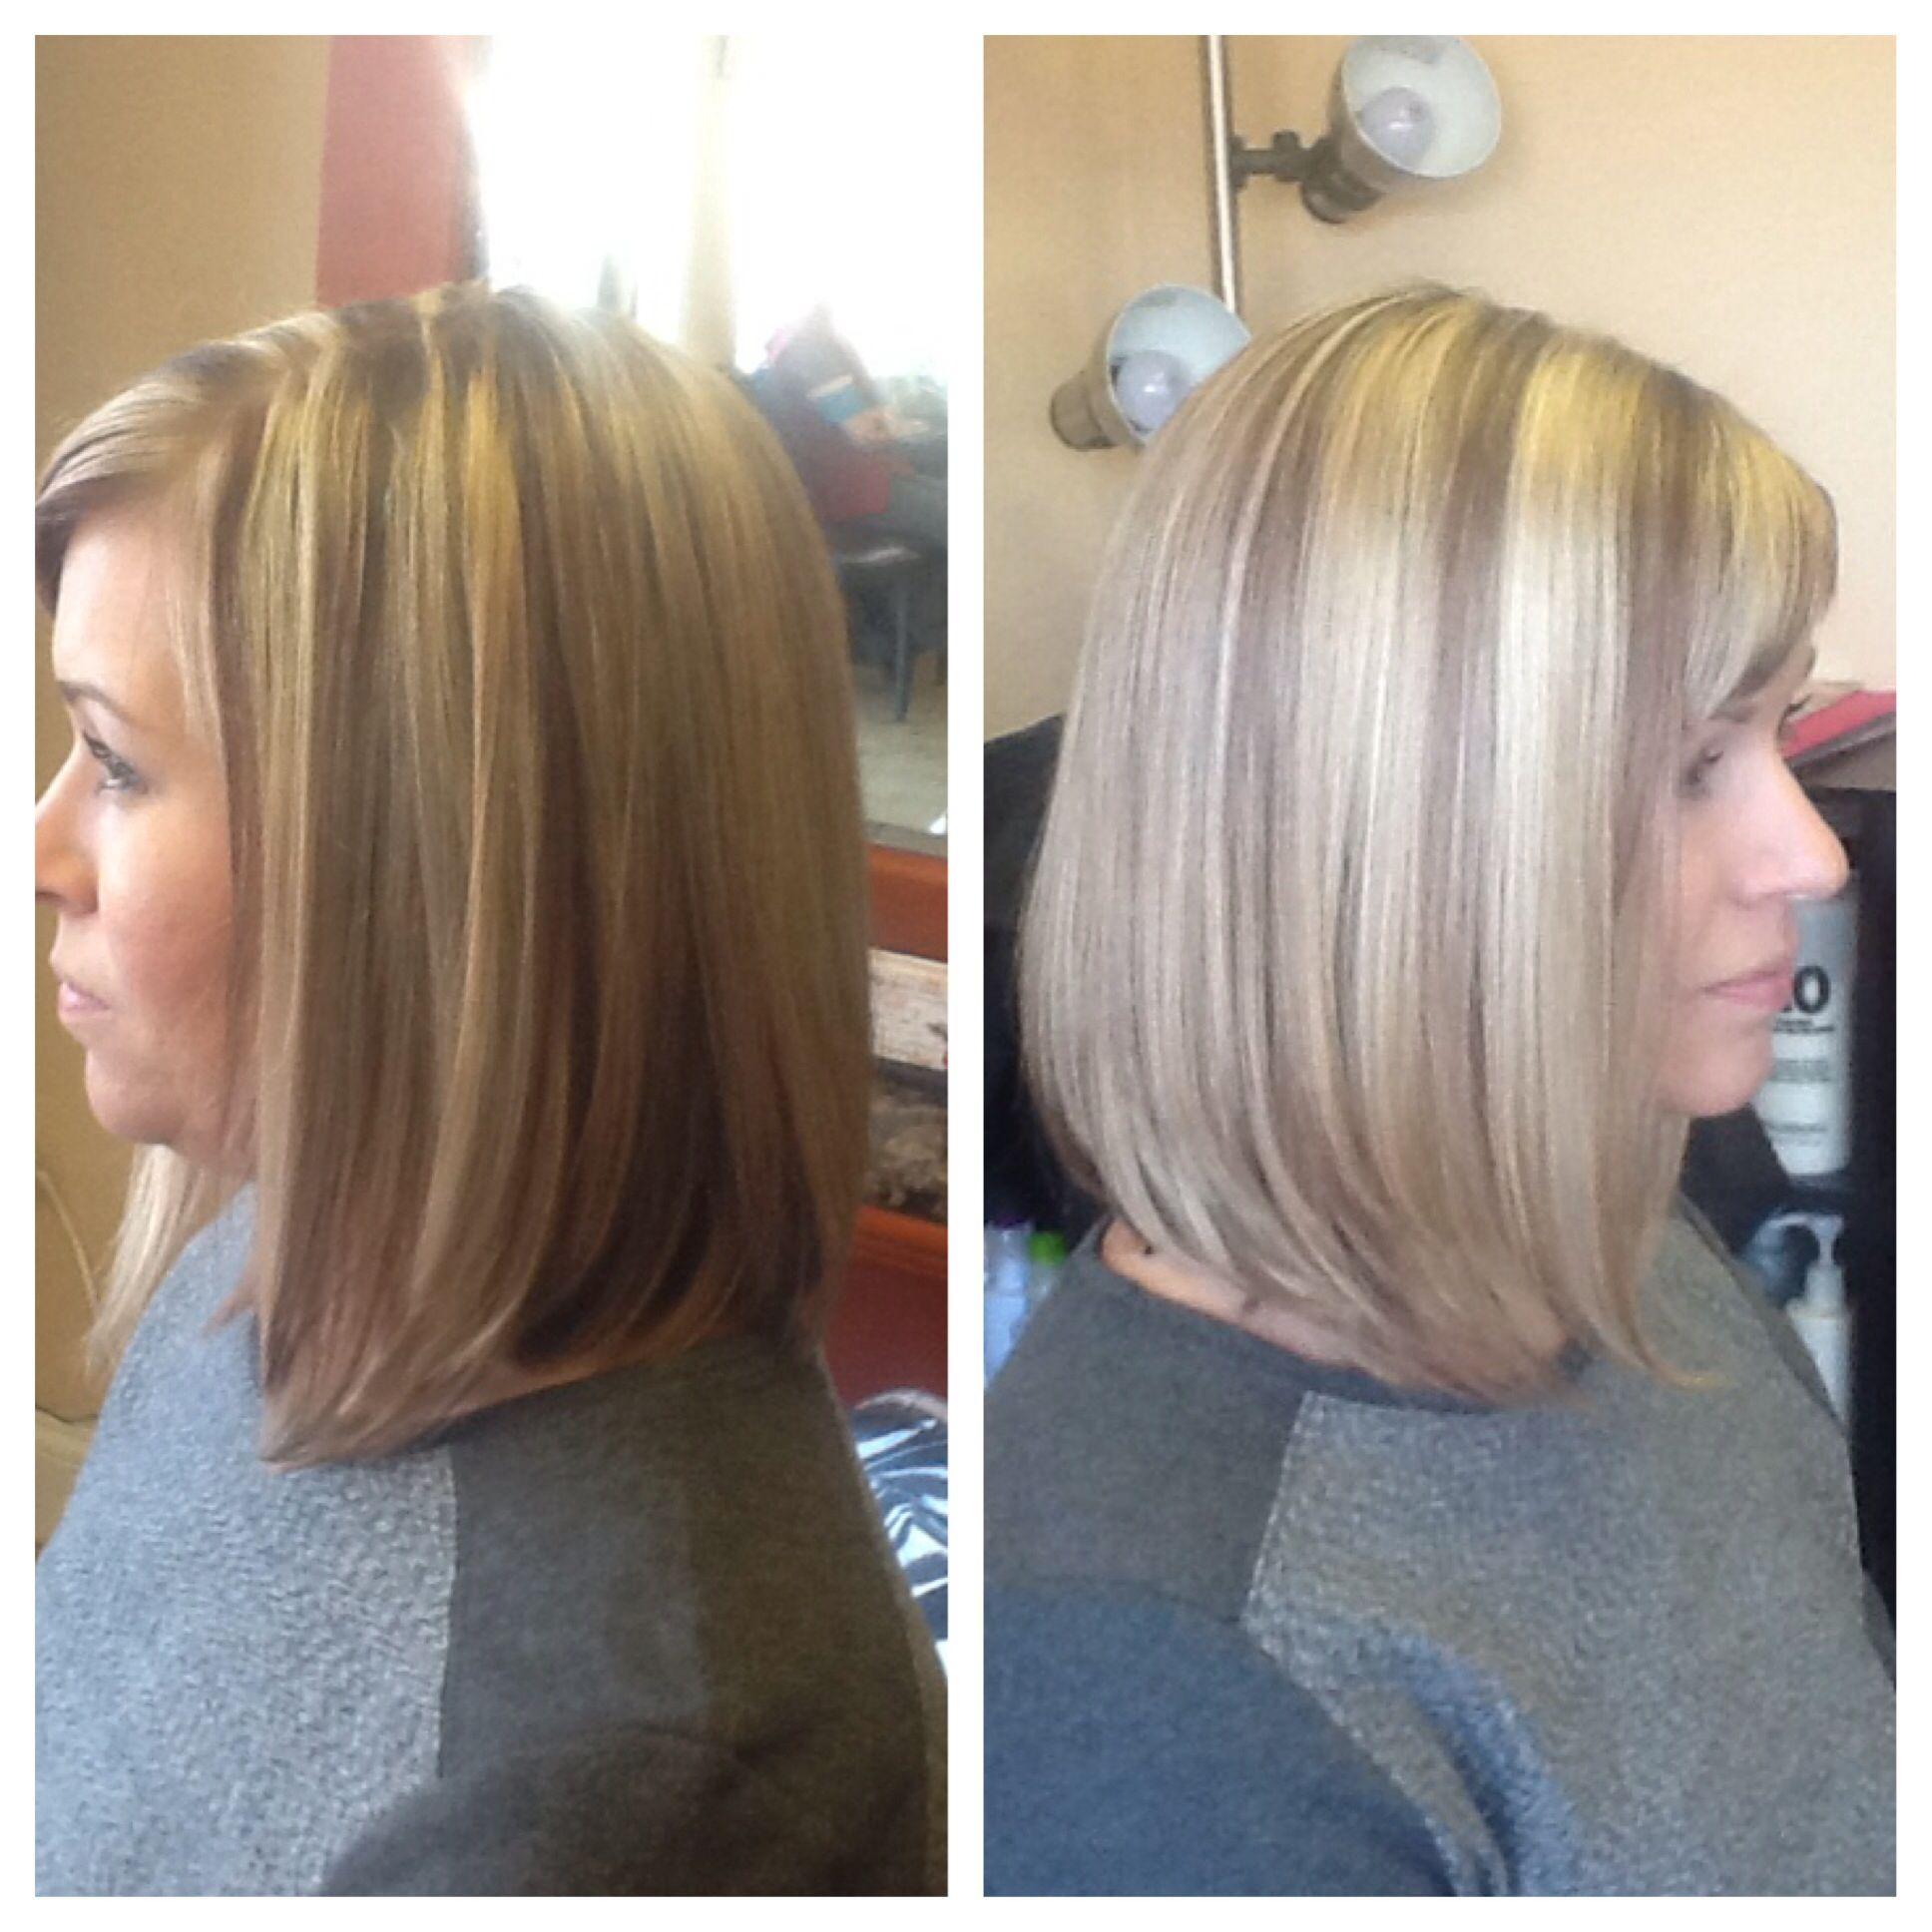 Long bob haircut and color by amber crouse michelleus salon u day